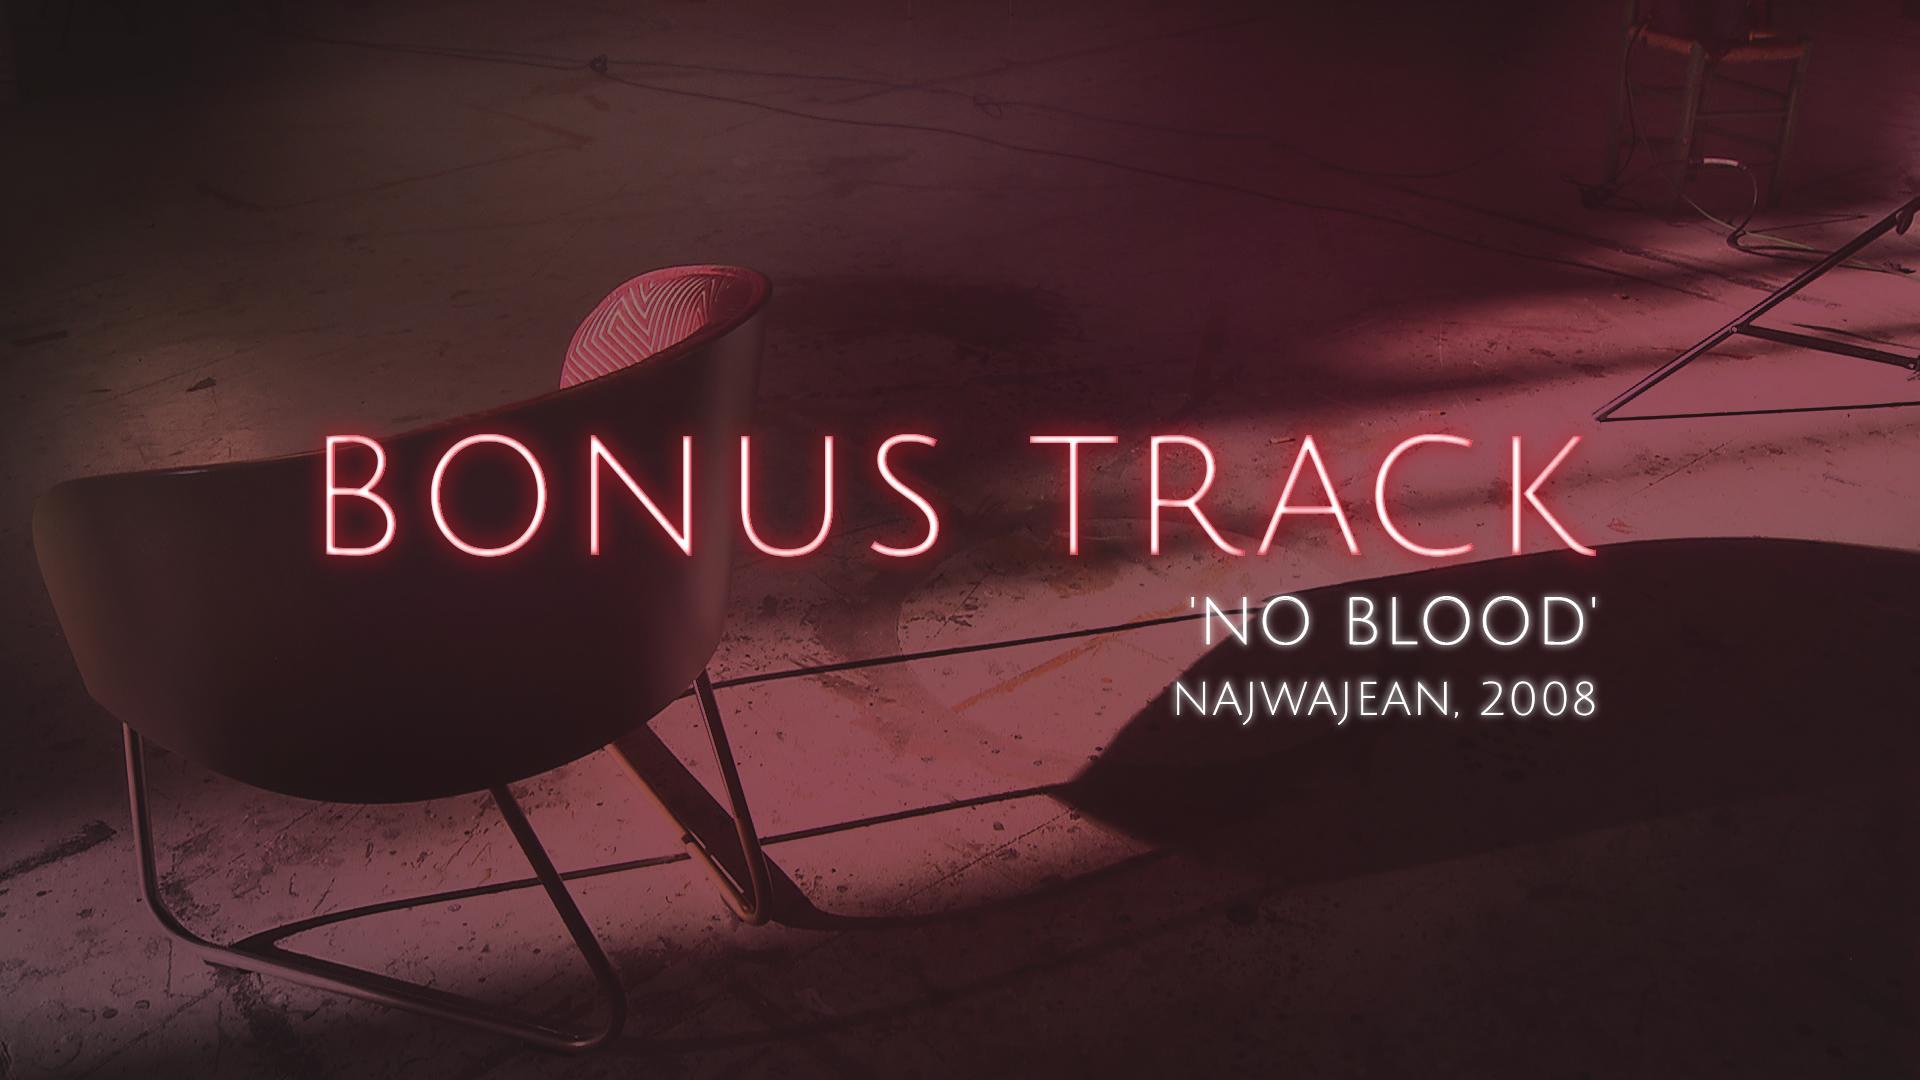 Bonus Track - 'No Blood', NajwaJean (Teaser) - 22/09/17